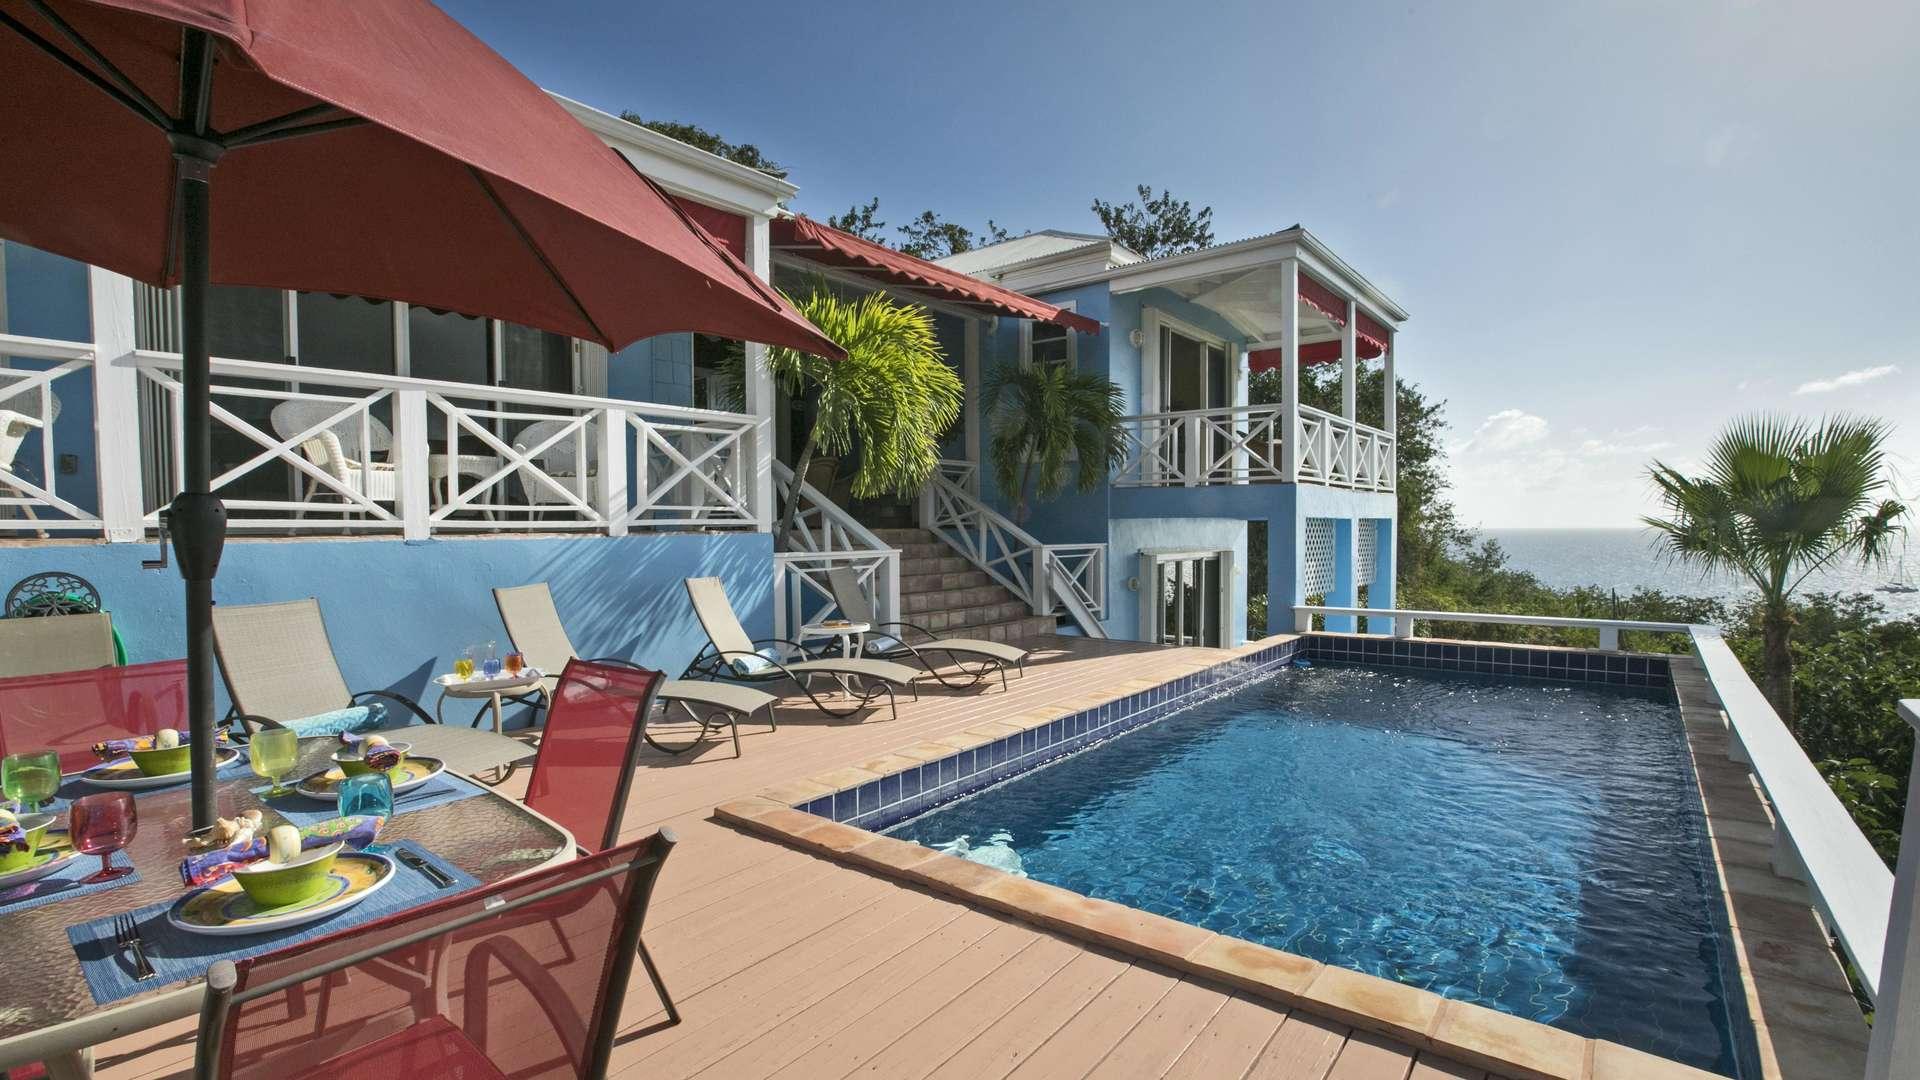 Luxury villa rentals caribbean - Usvi - St thomas - Frenchmans bay - CalypsoBlu - Image 1/13